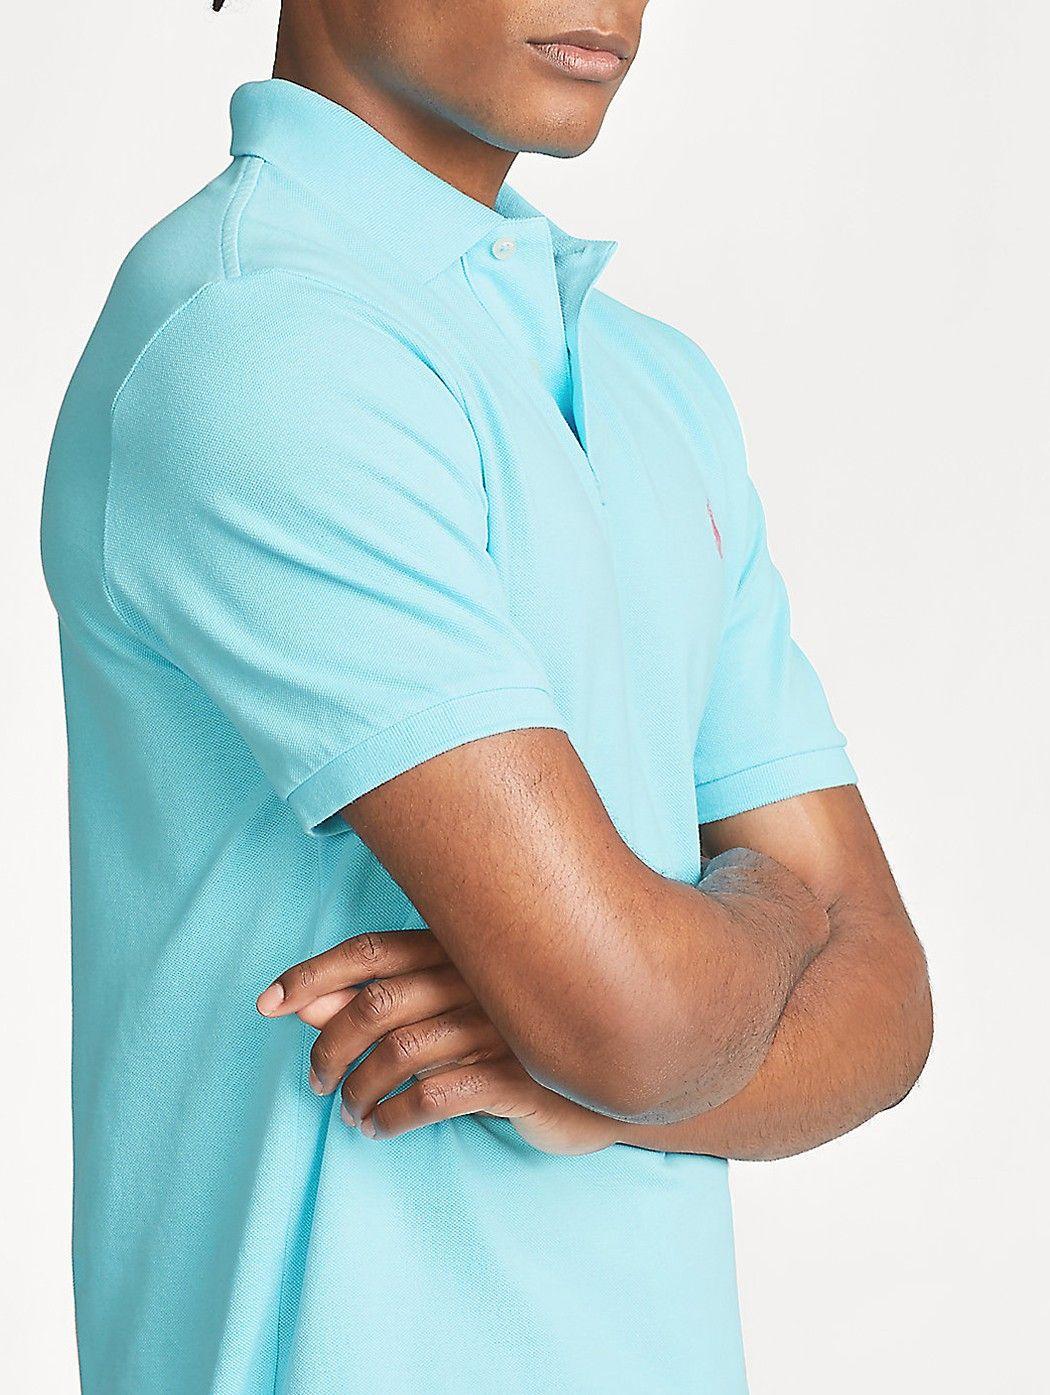 Polo in piqu' Slim-Fit POLO RALPH LAUREN UOMO 710795080 024